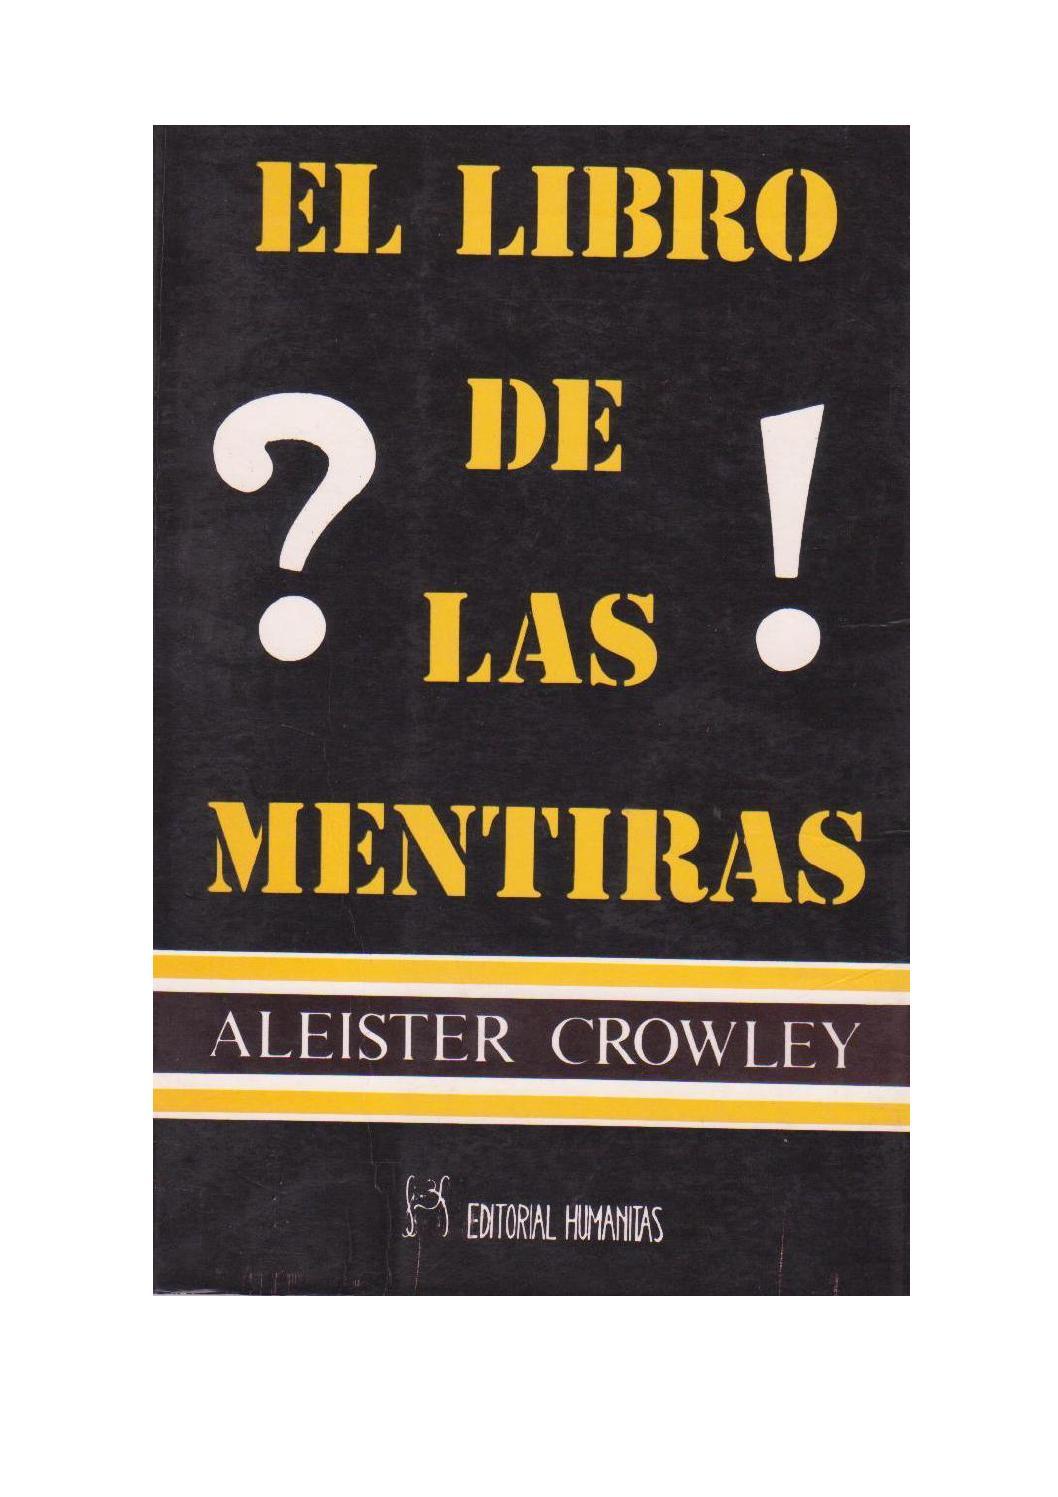 777 aleister crowley pdf portugues